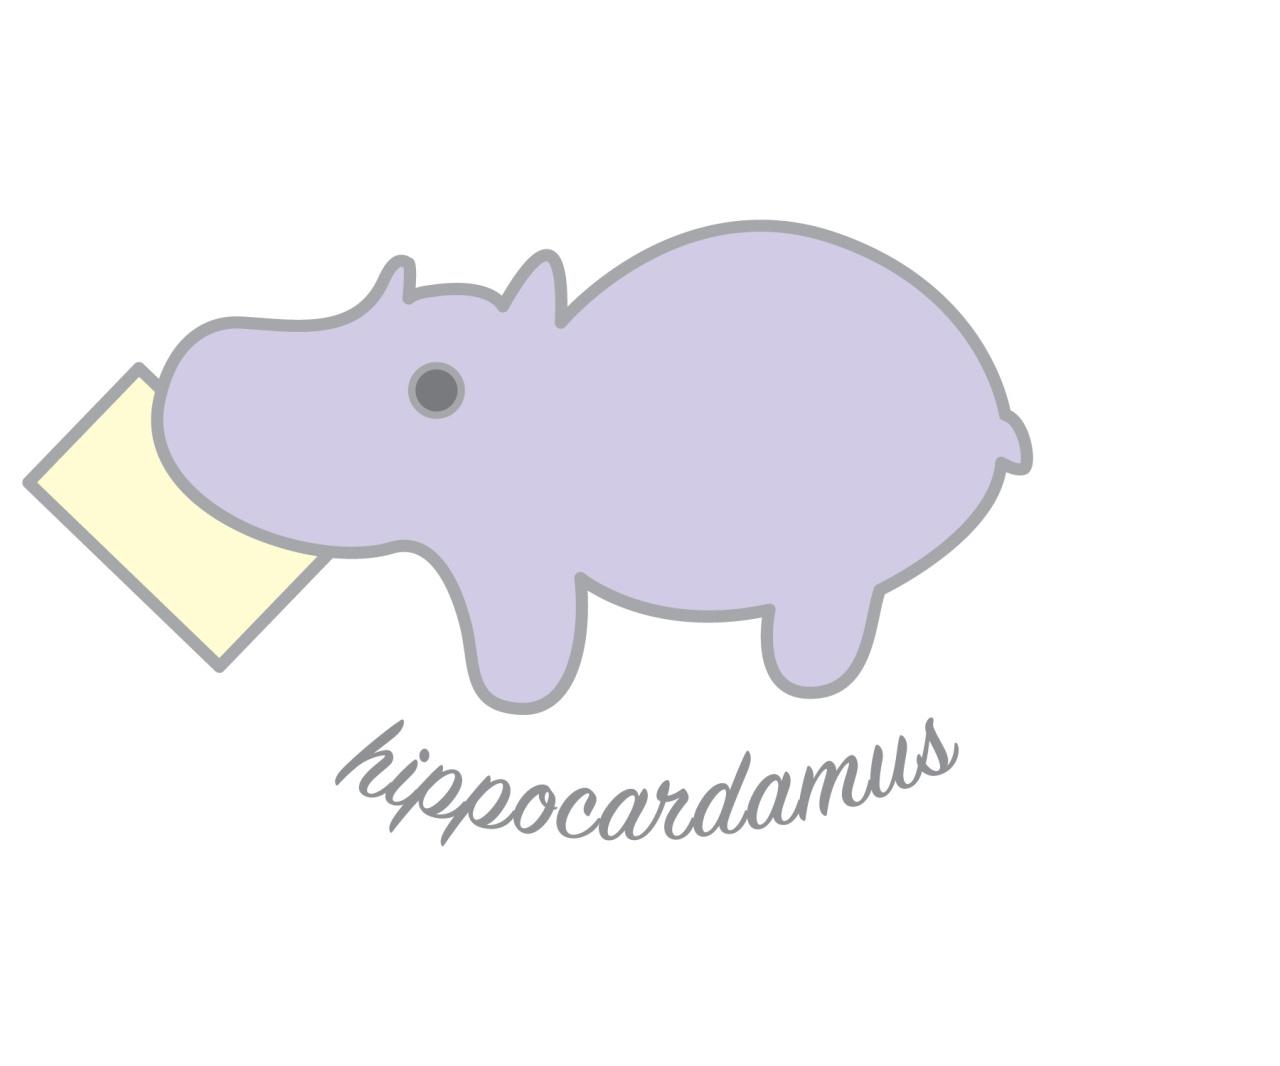 Hippocardamus: Logo